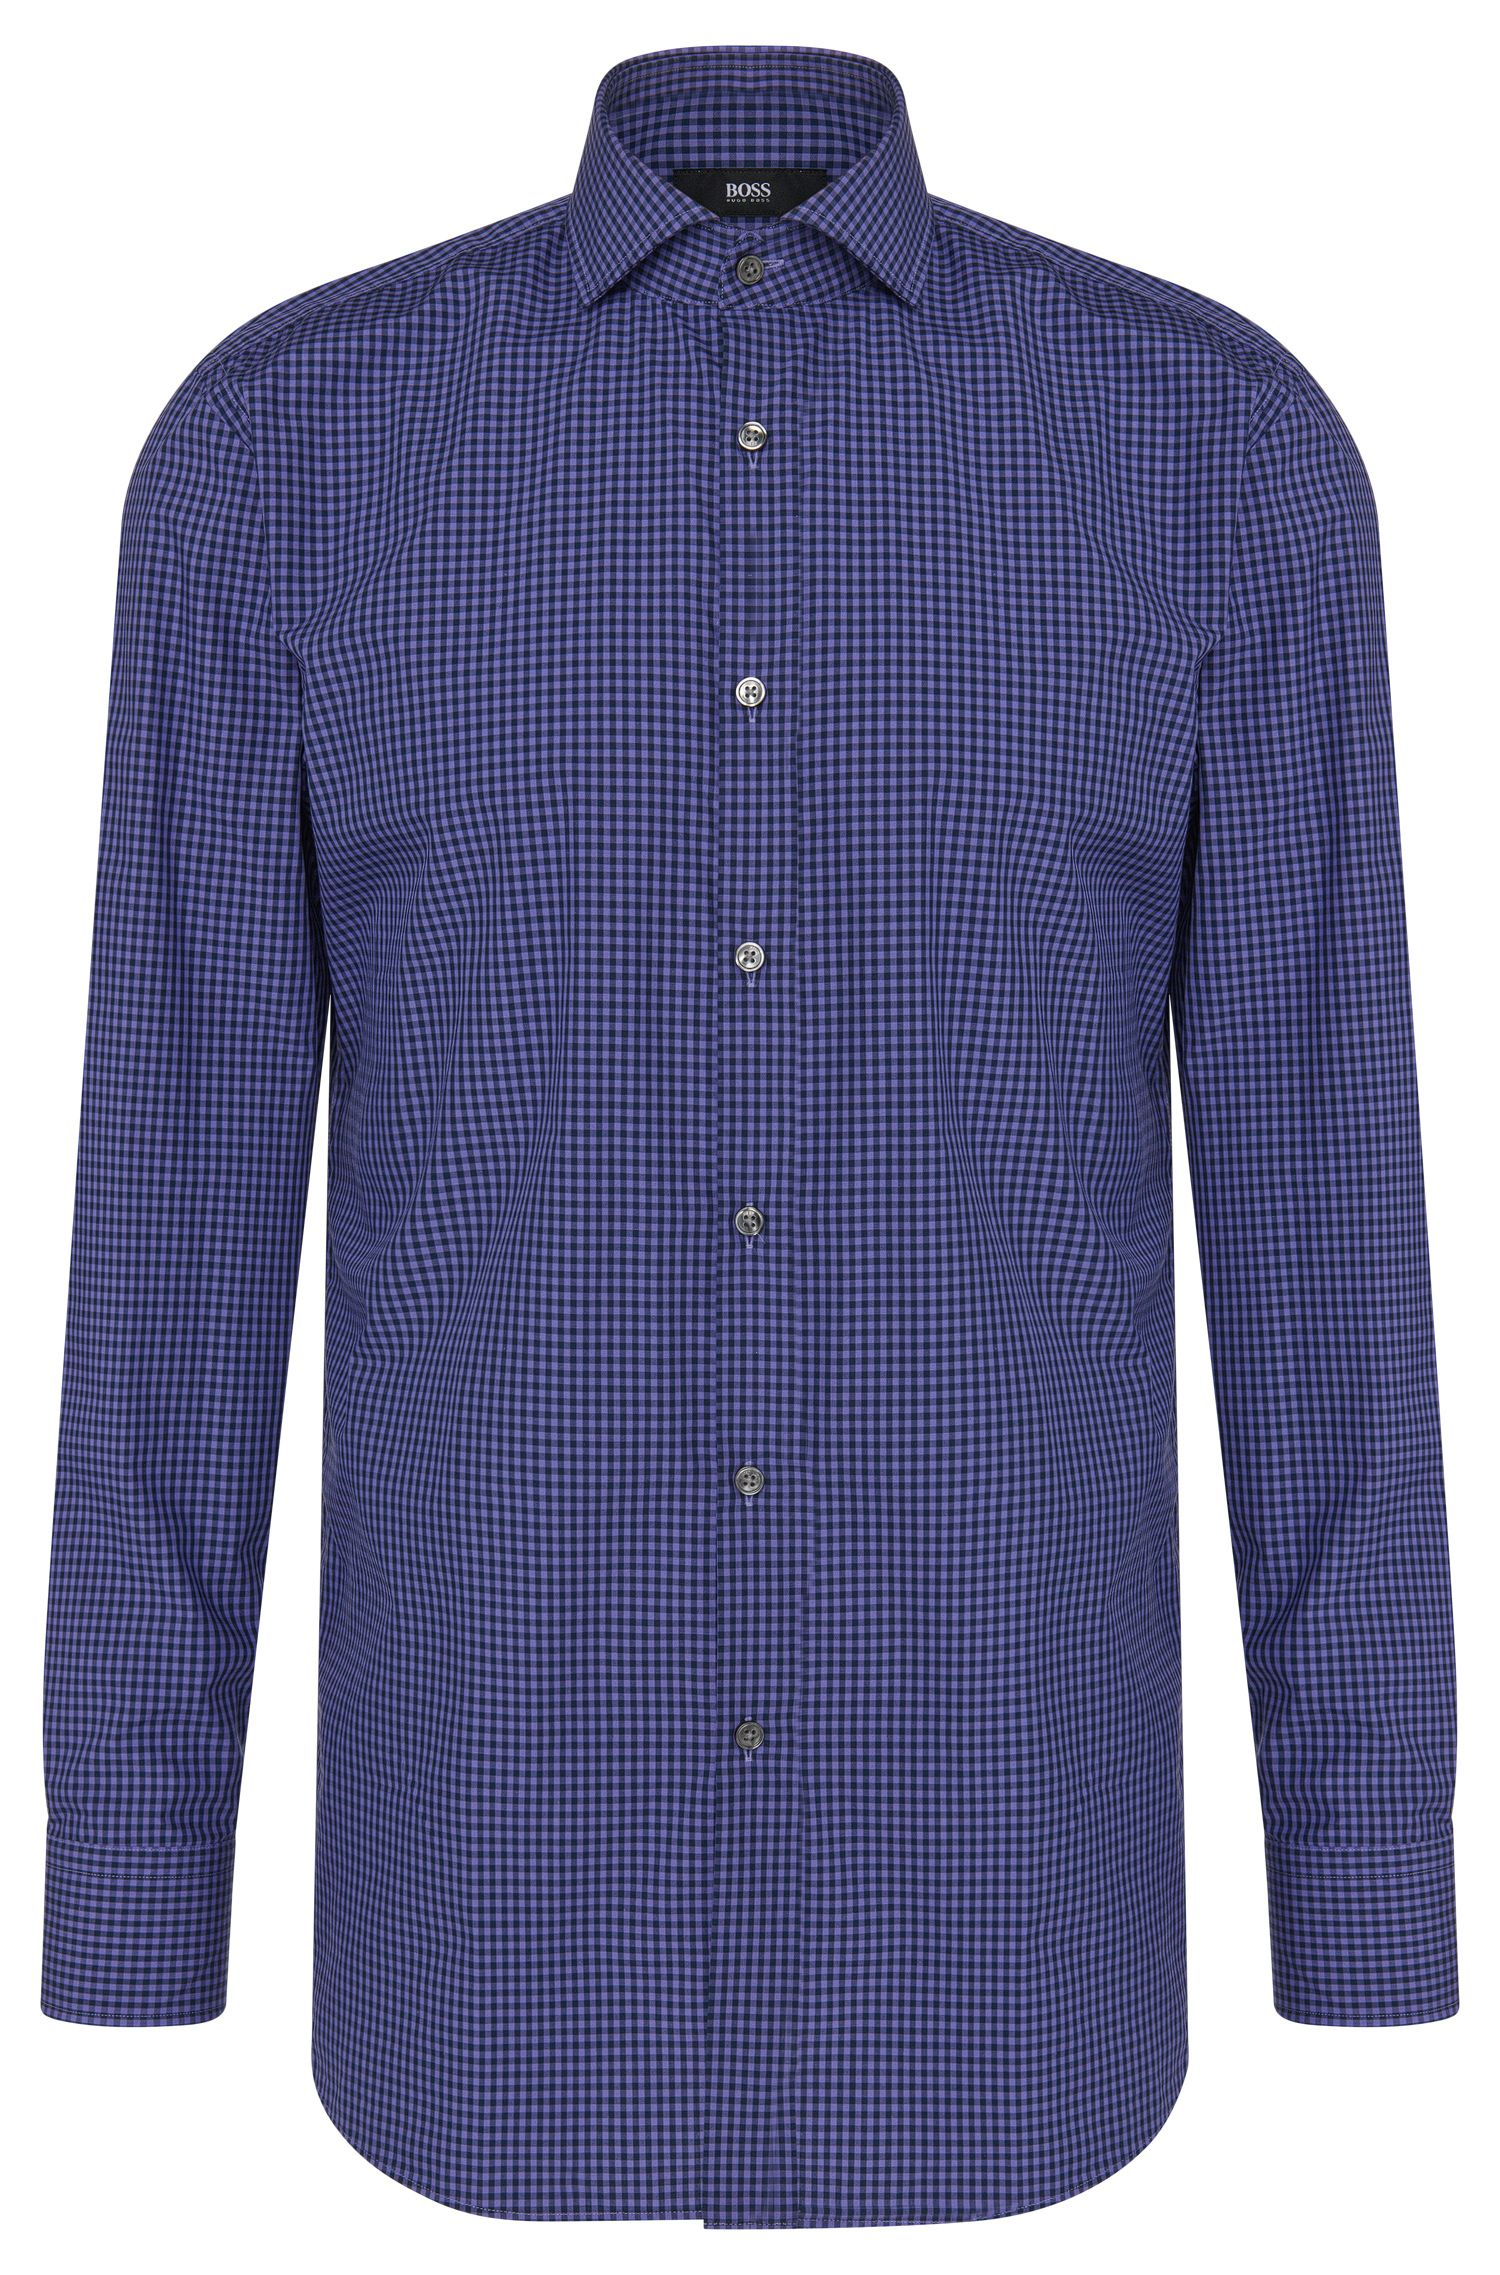 Gingham Cotton Dress Shirt, Sharp Fit | Mark US